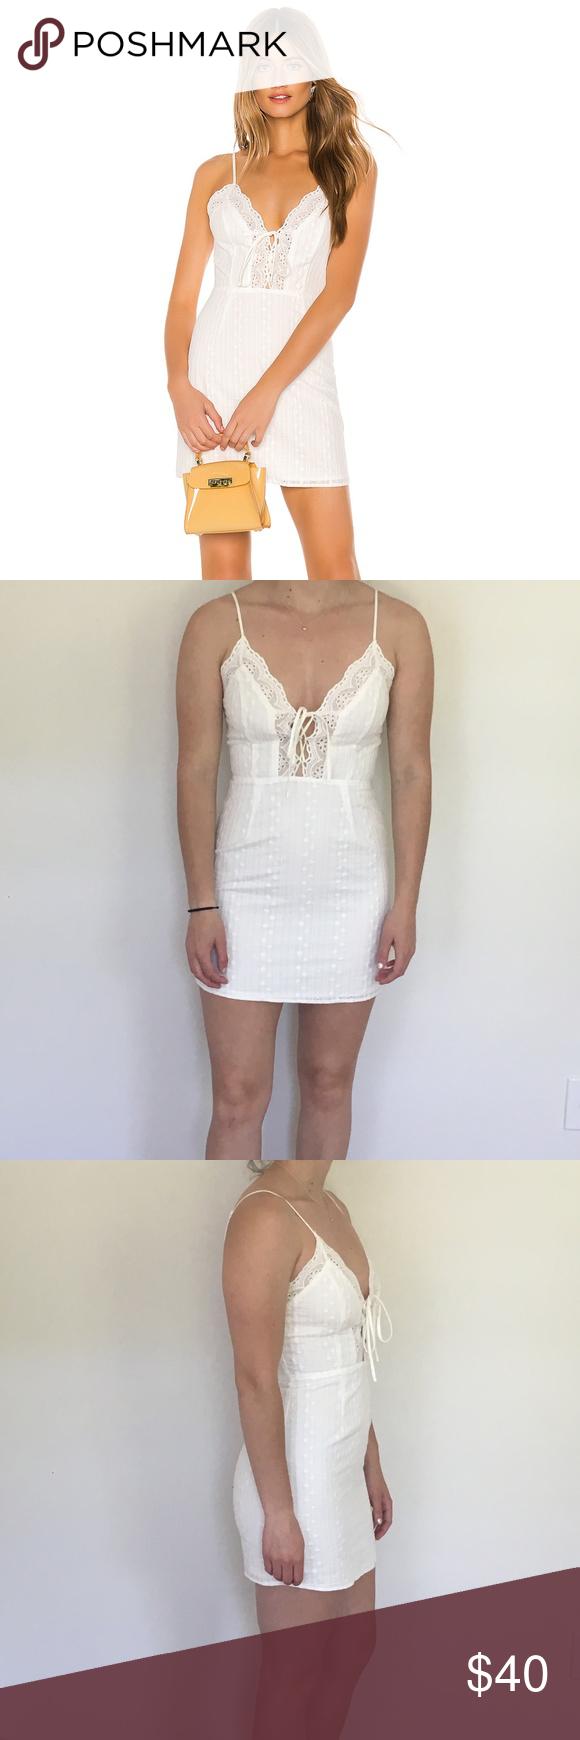 Superdown Alexi Eyelet Dress In White Eyelet Dress Dresses White Dress [ 1740 x 580 Pixel ]